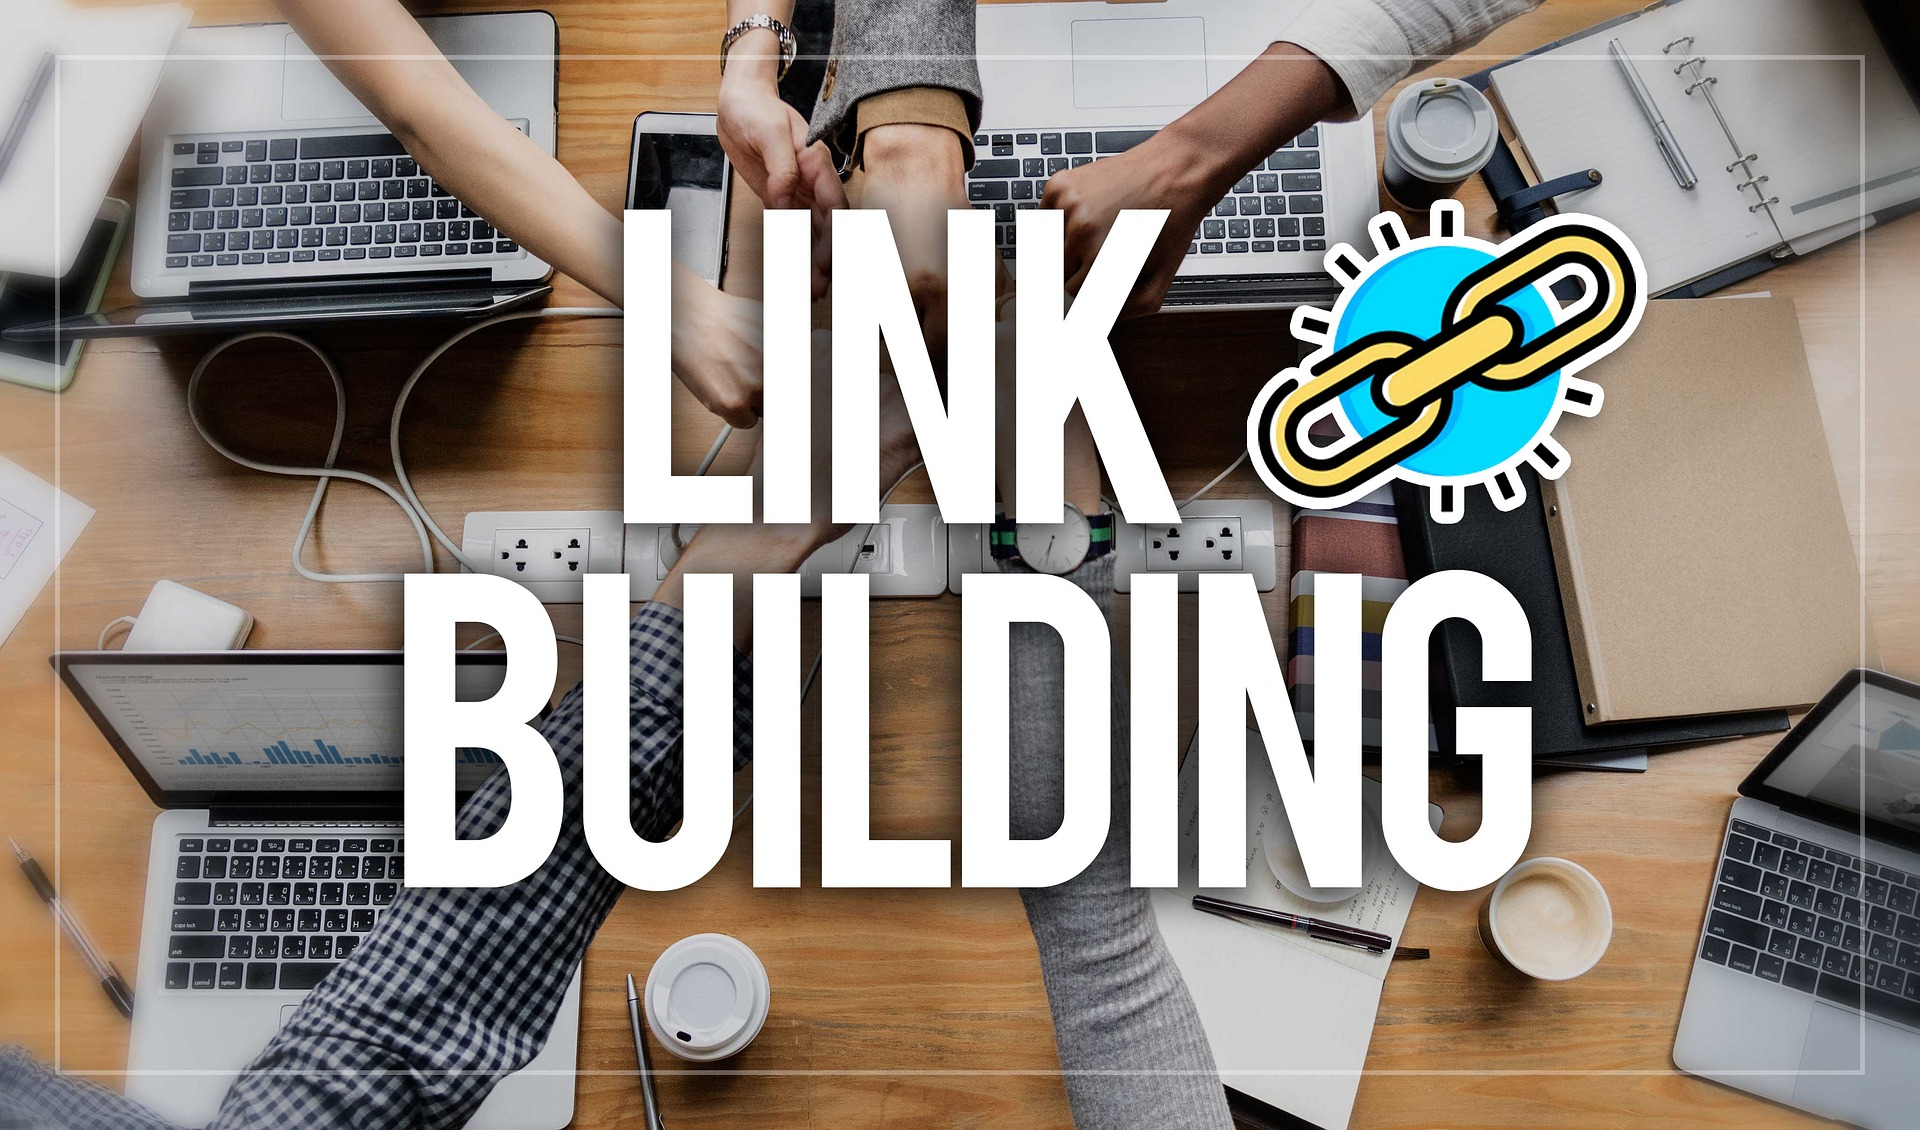 Link Building Software